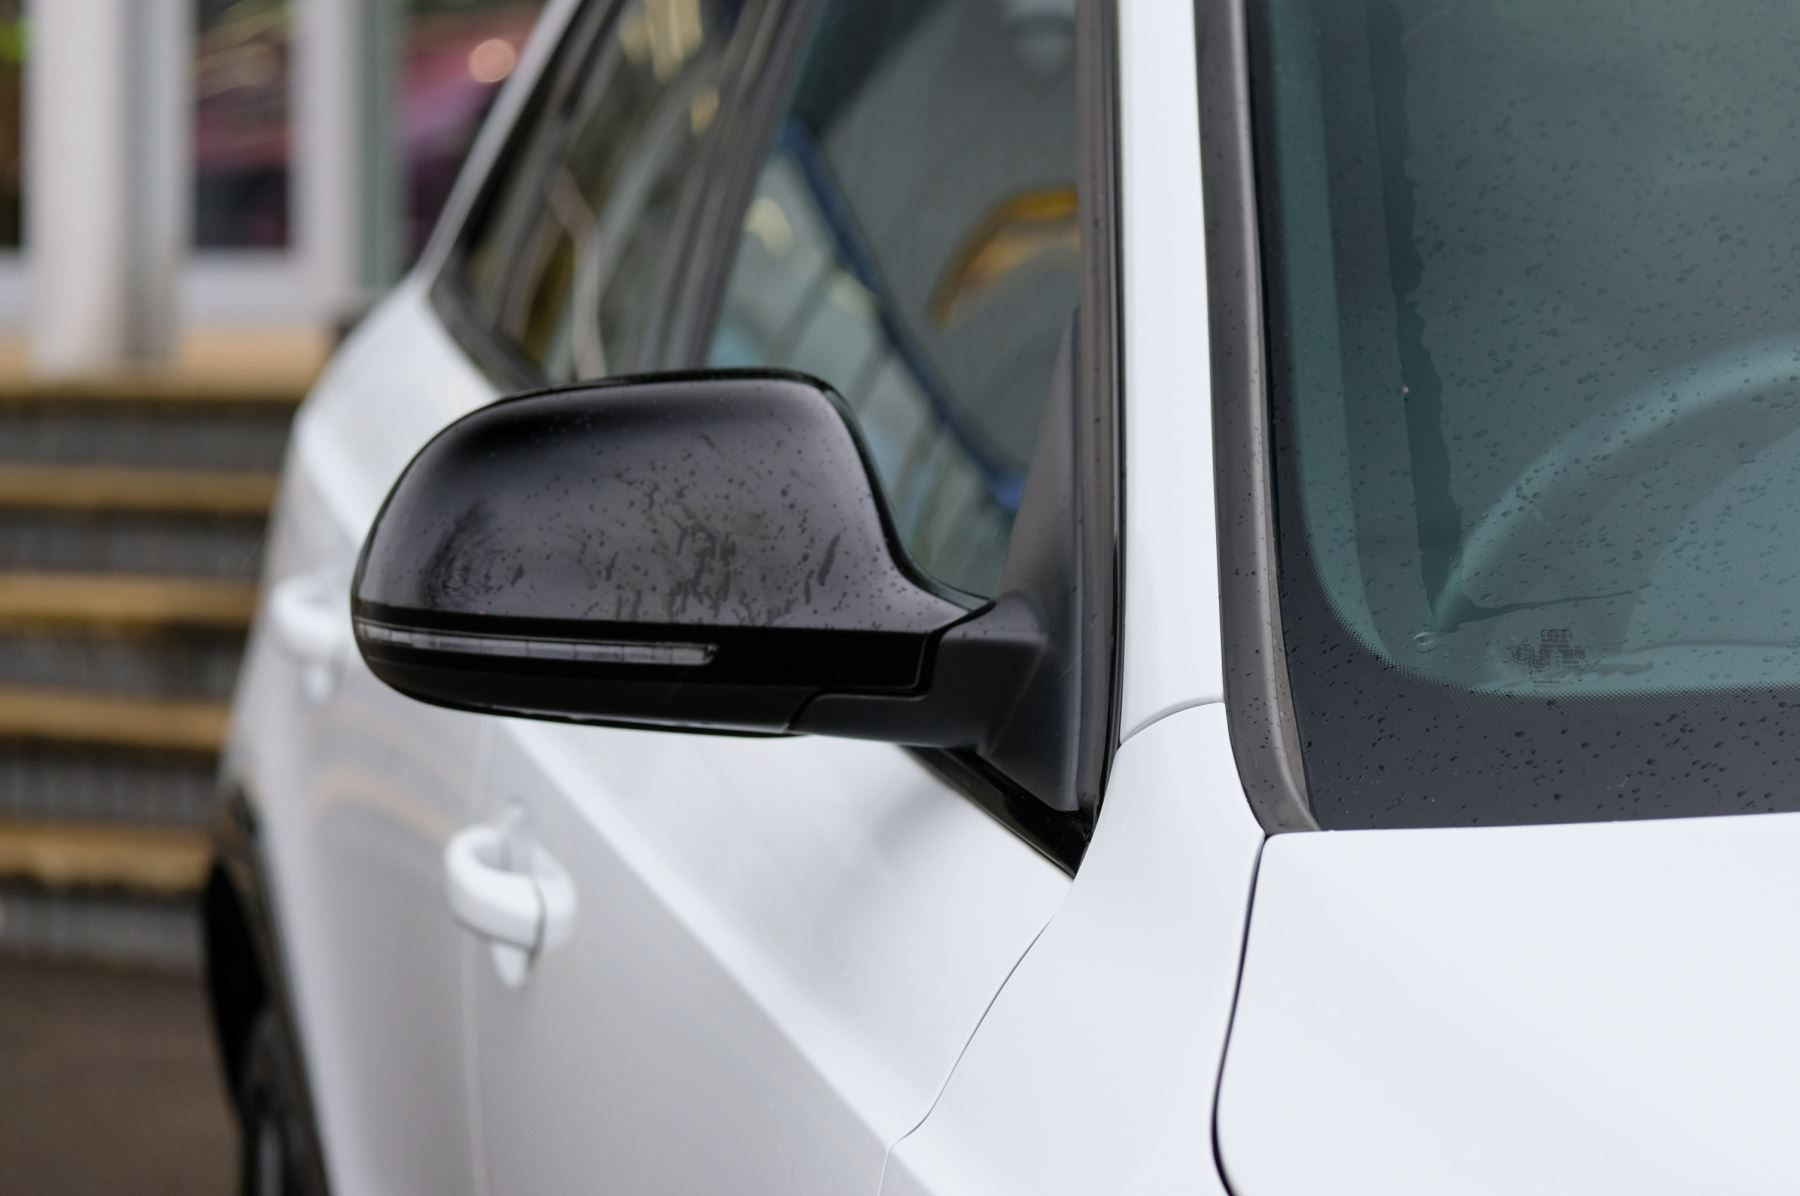 Audi Q3 2.0T FSI Quattro Black Edition 5dr S Tronic - Panoramic glass sunroof image 6